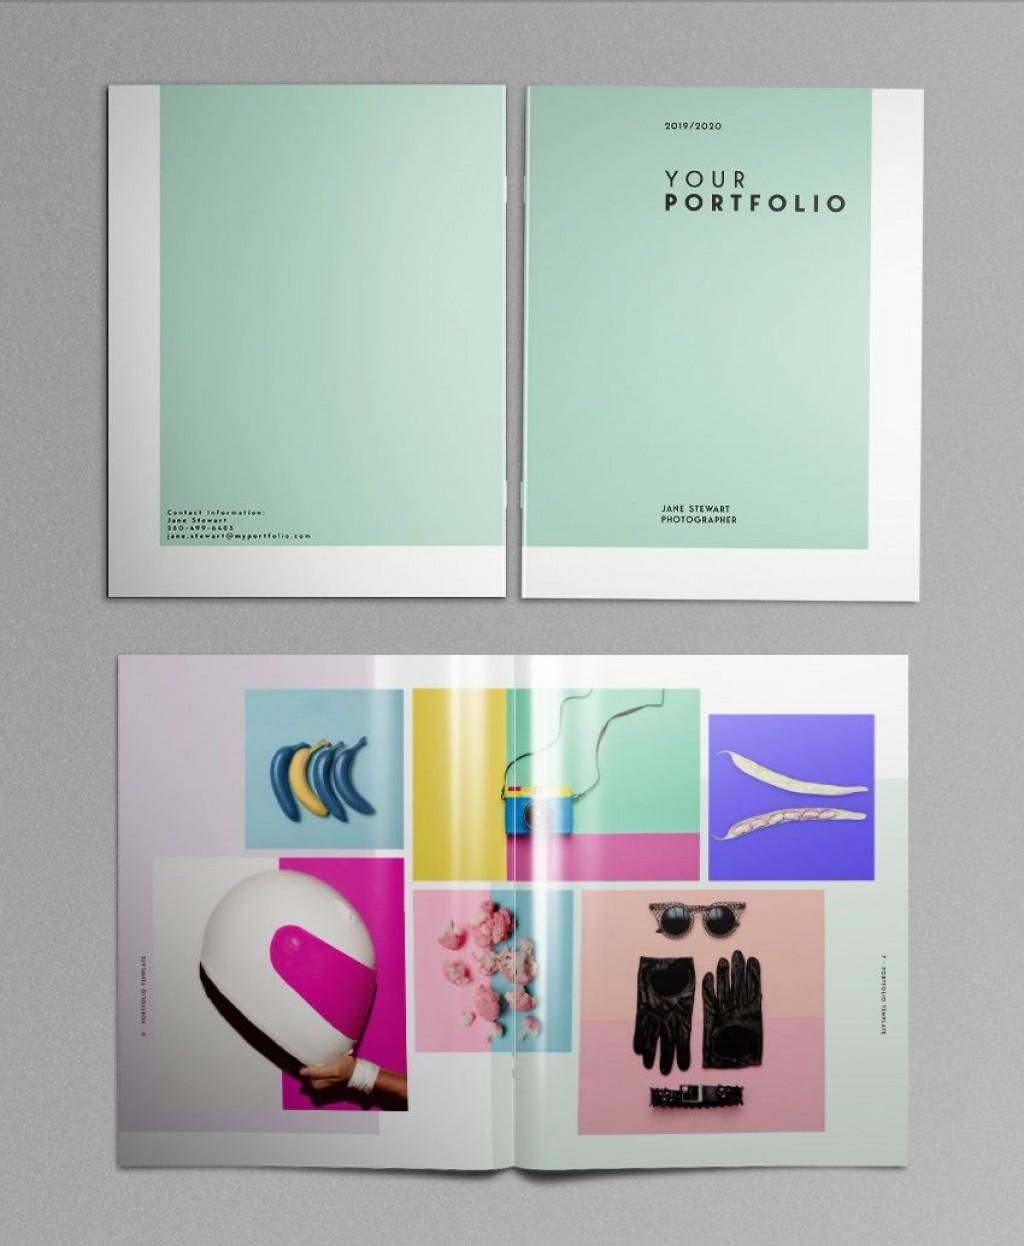 000 Singular In Design Portfolio Template High Resolution  Free Indesign A3 Photography Graphic DownloadLarge